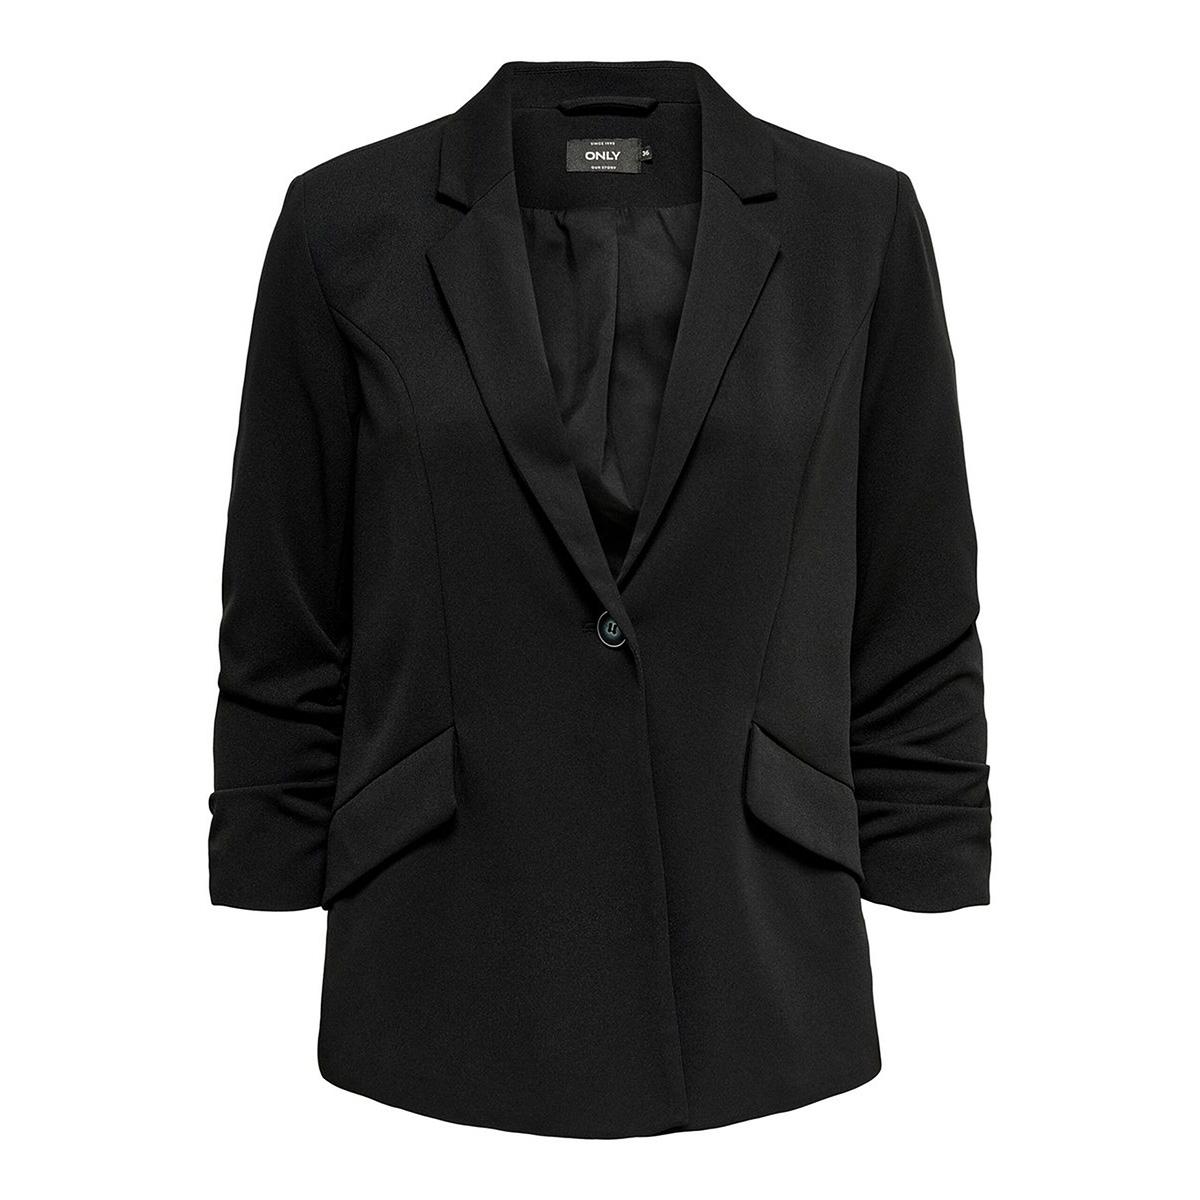 onlcarolina 3/4 blazer cc tlr 15180106 only blazer black